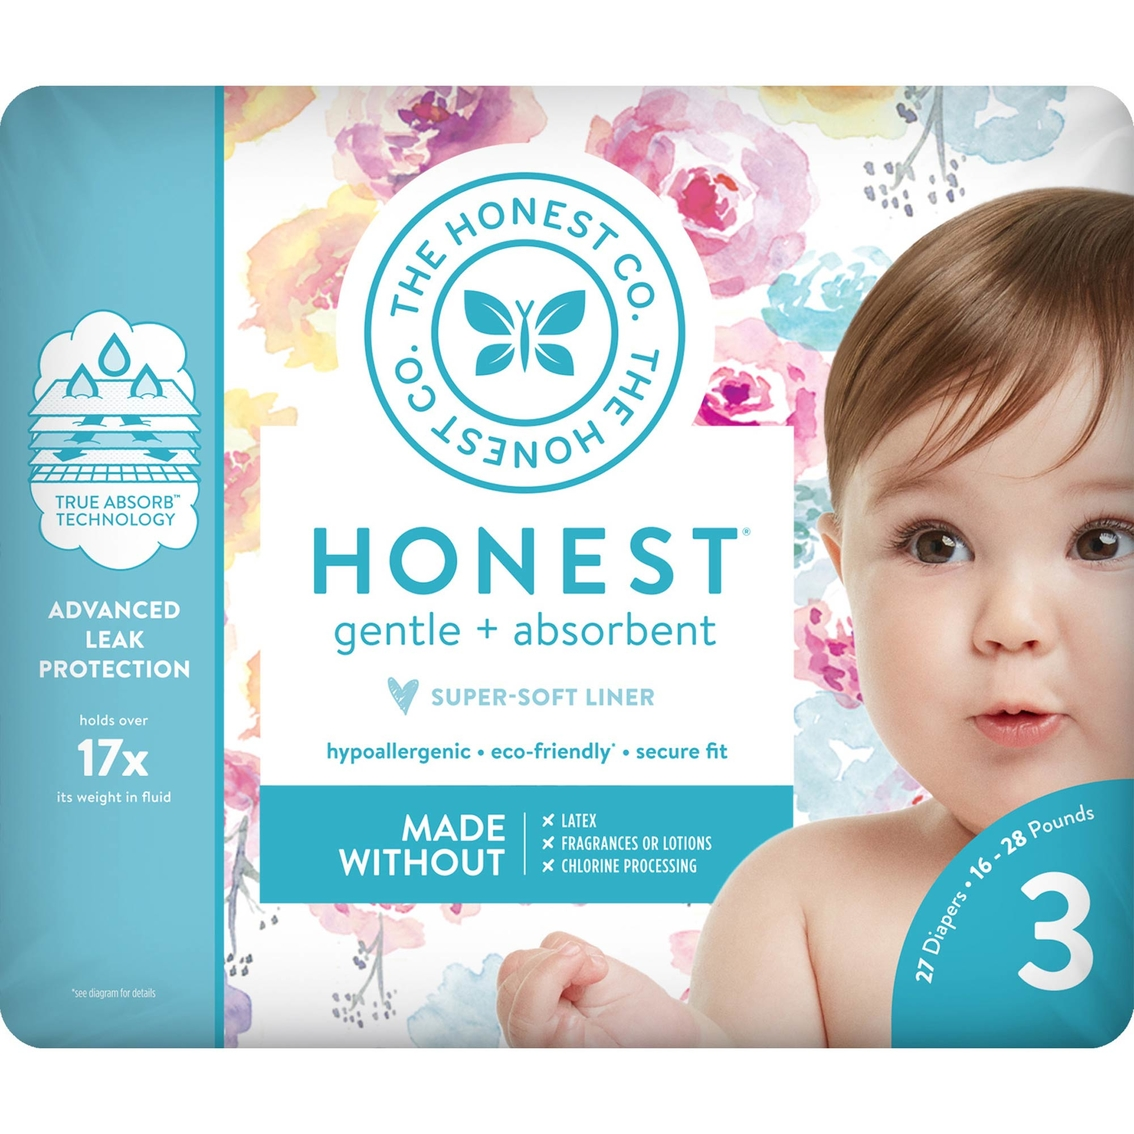 0832dfc30f133 The Honest Company Honest Diaper Rose Blossom Size 3, 34 Ct ...